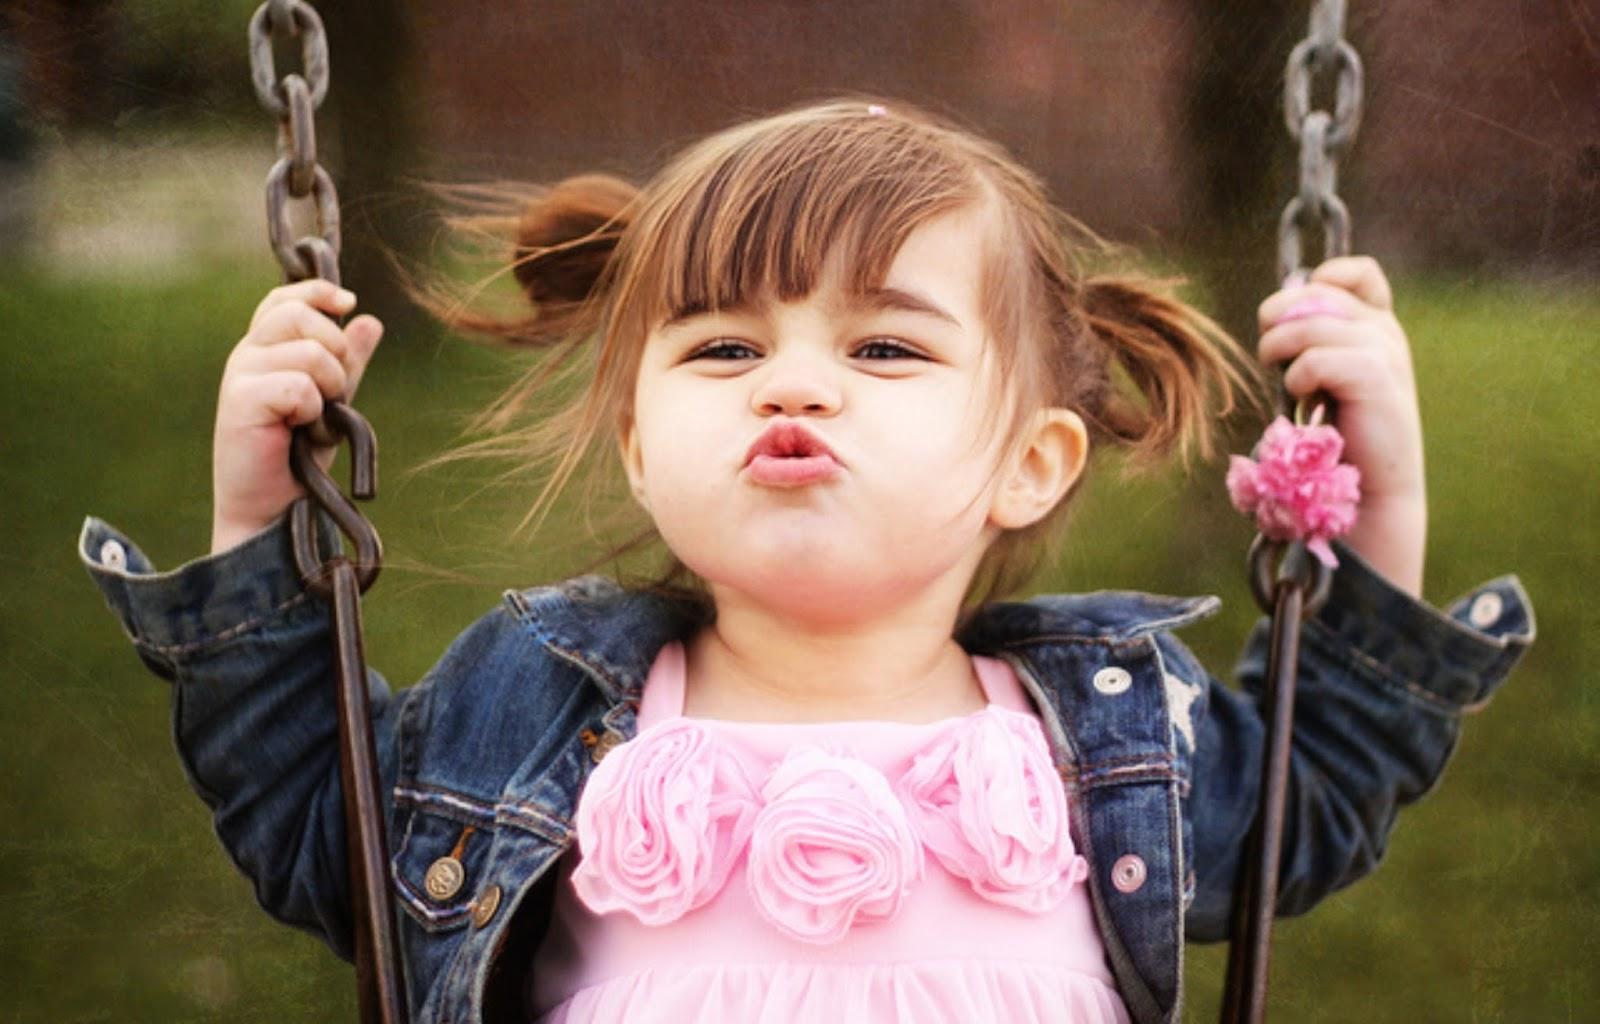 Latest Cute Baby - Sweet Baby HD Wallpaper in 1080p ~ Super HD ...